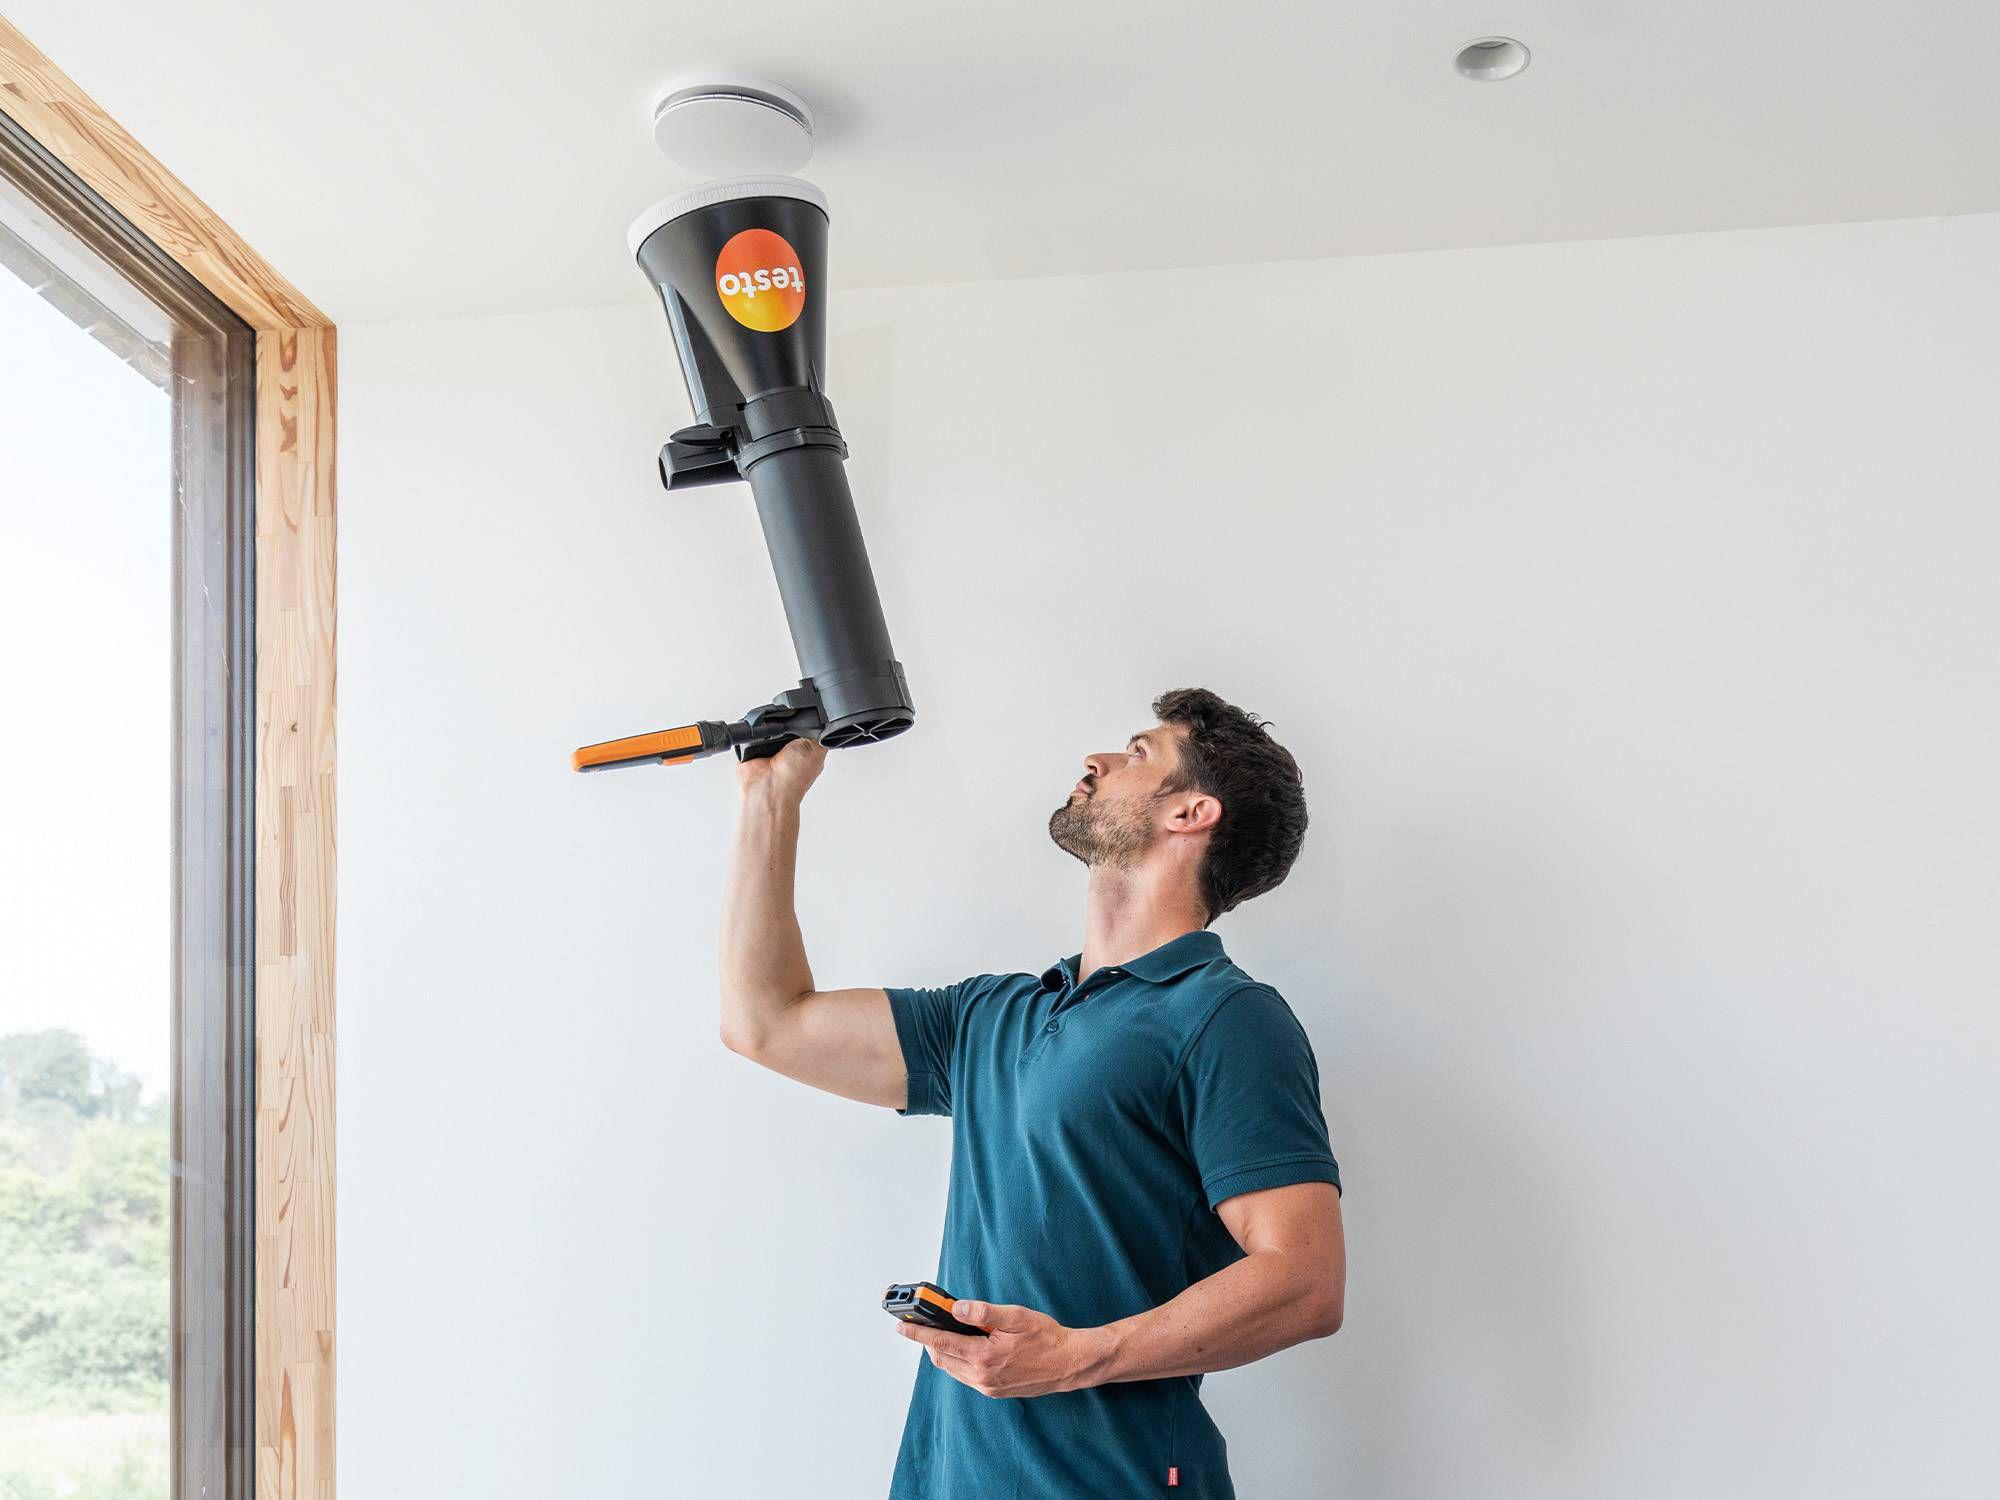 Adjusting indoor ventilation